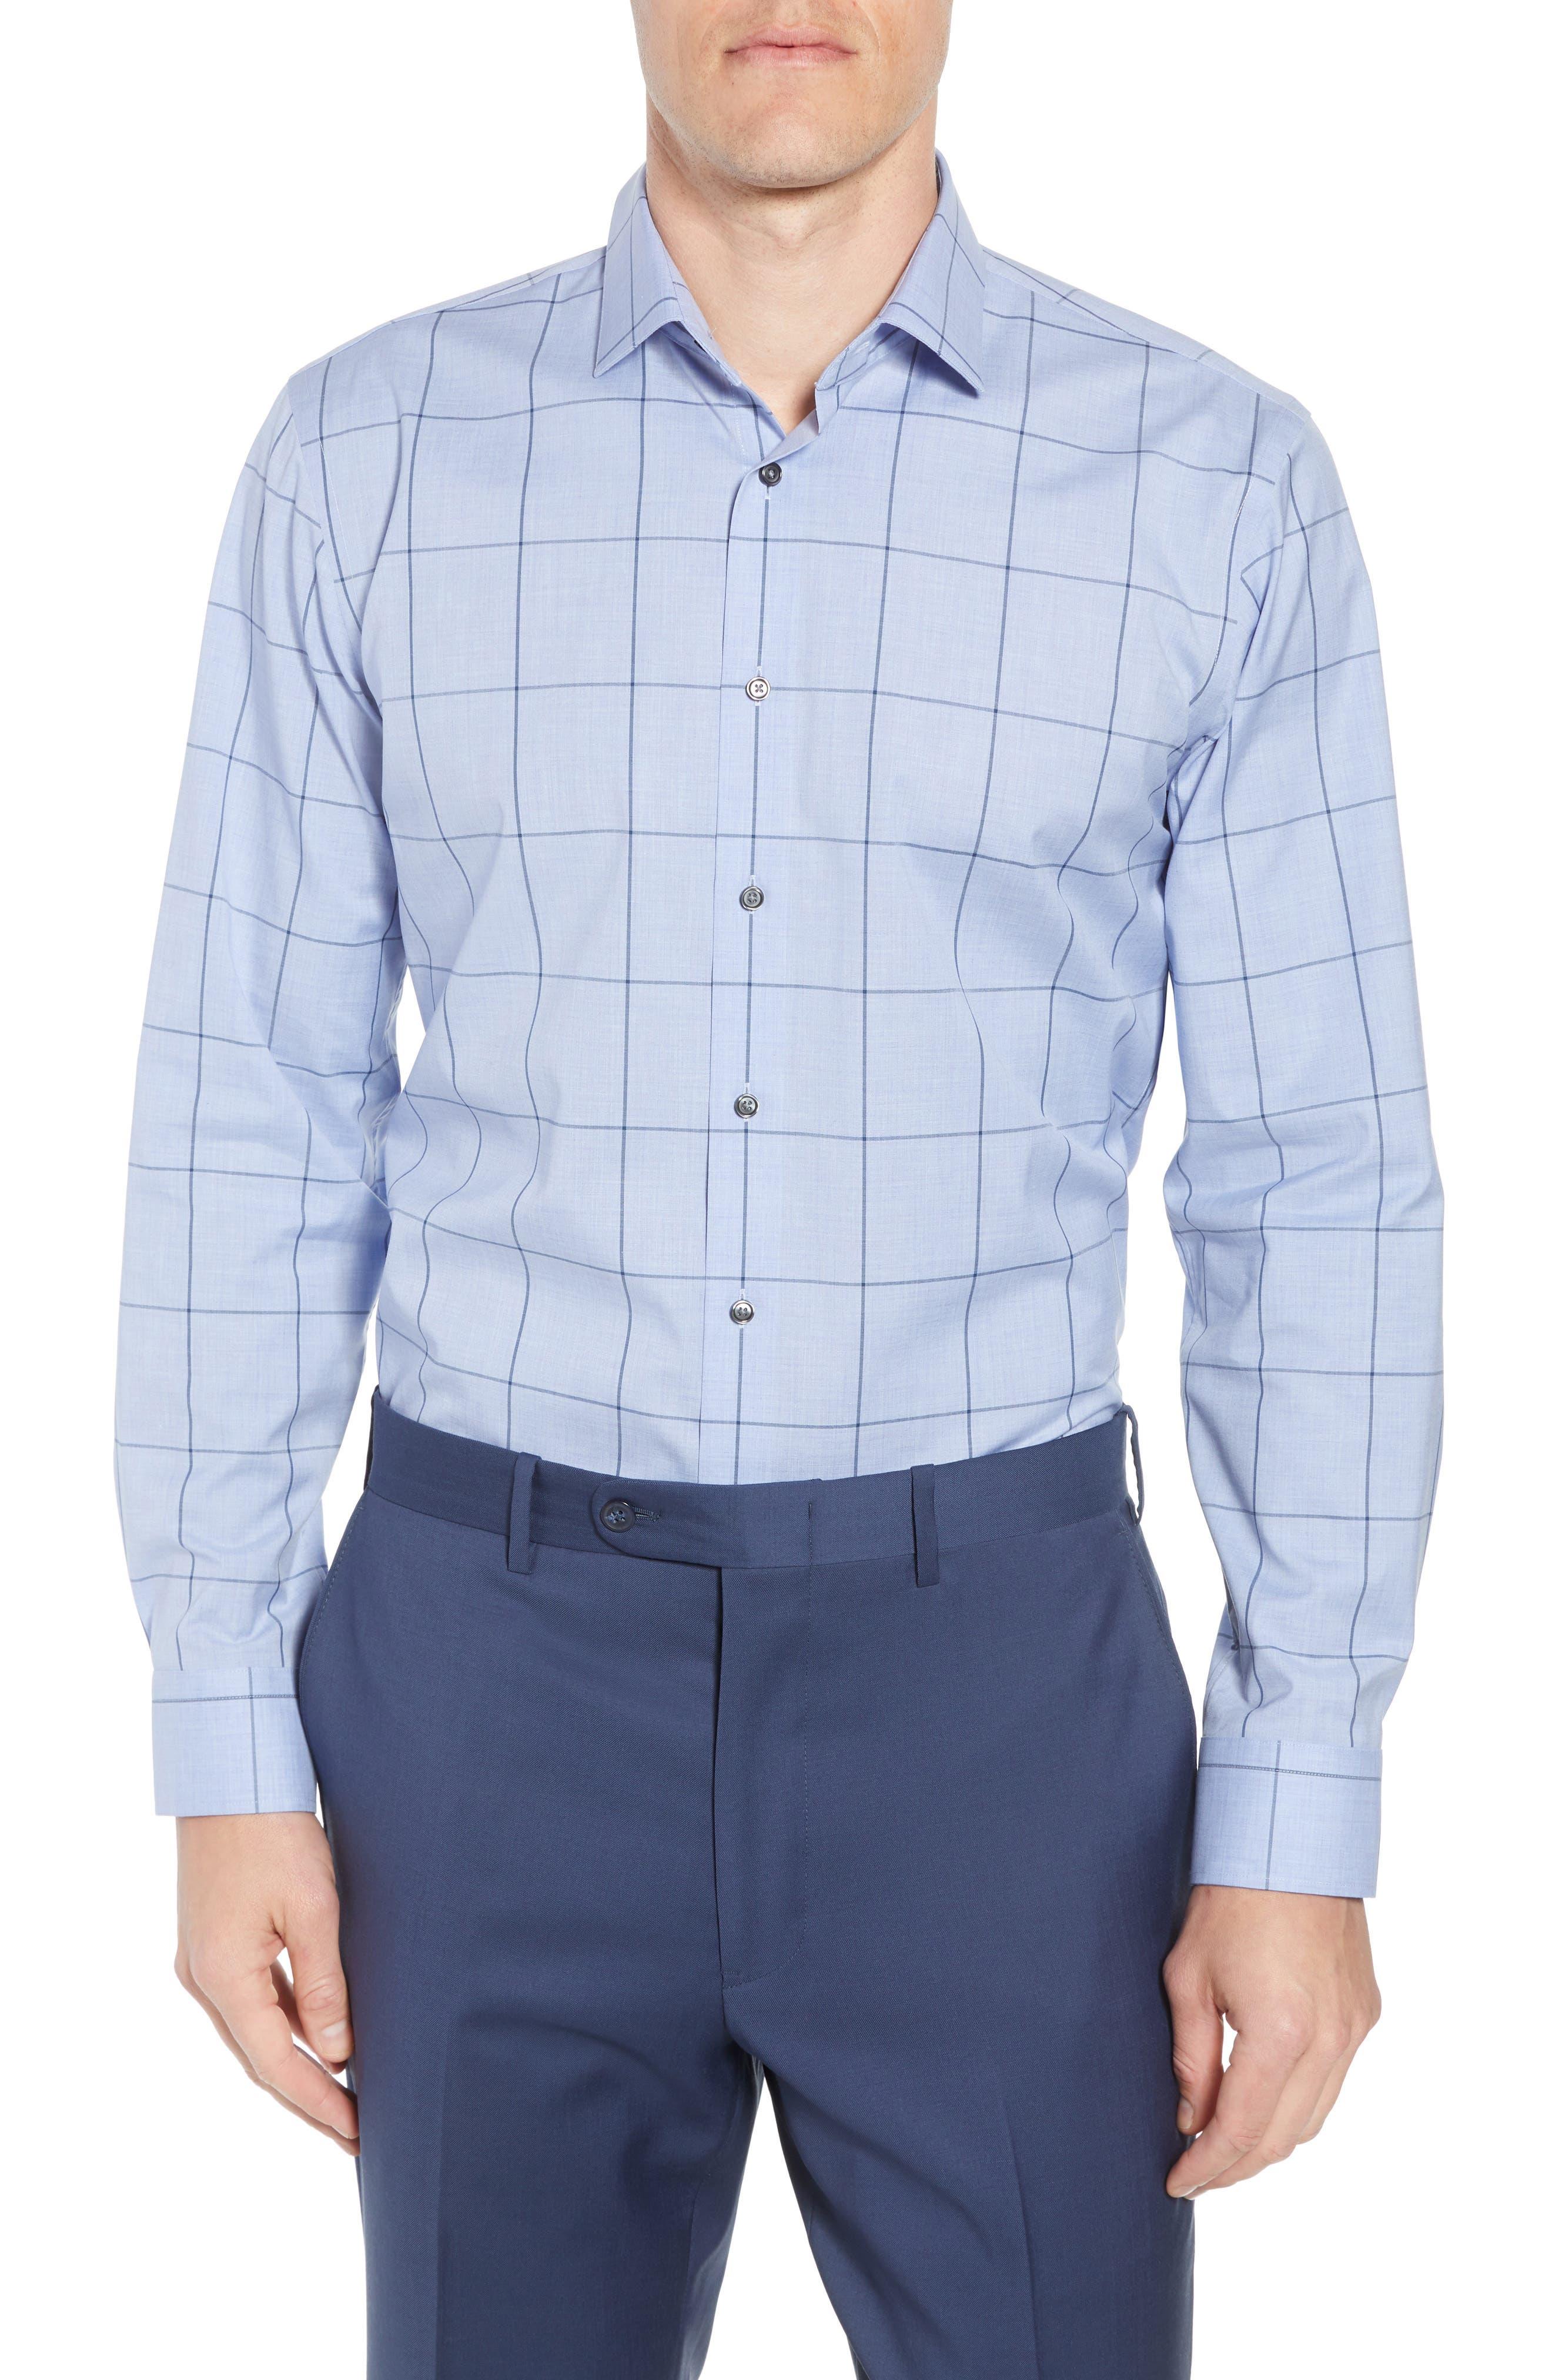 Trim Fit Non-Iron Windowpane Dress Shirt,                             Main thumbnail 1, color,                             BLUE HAZE